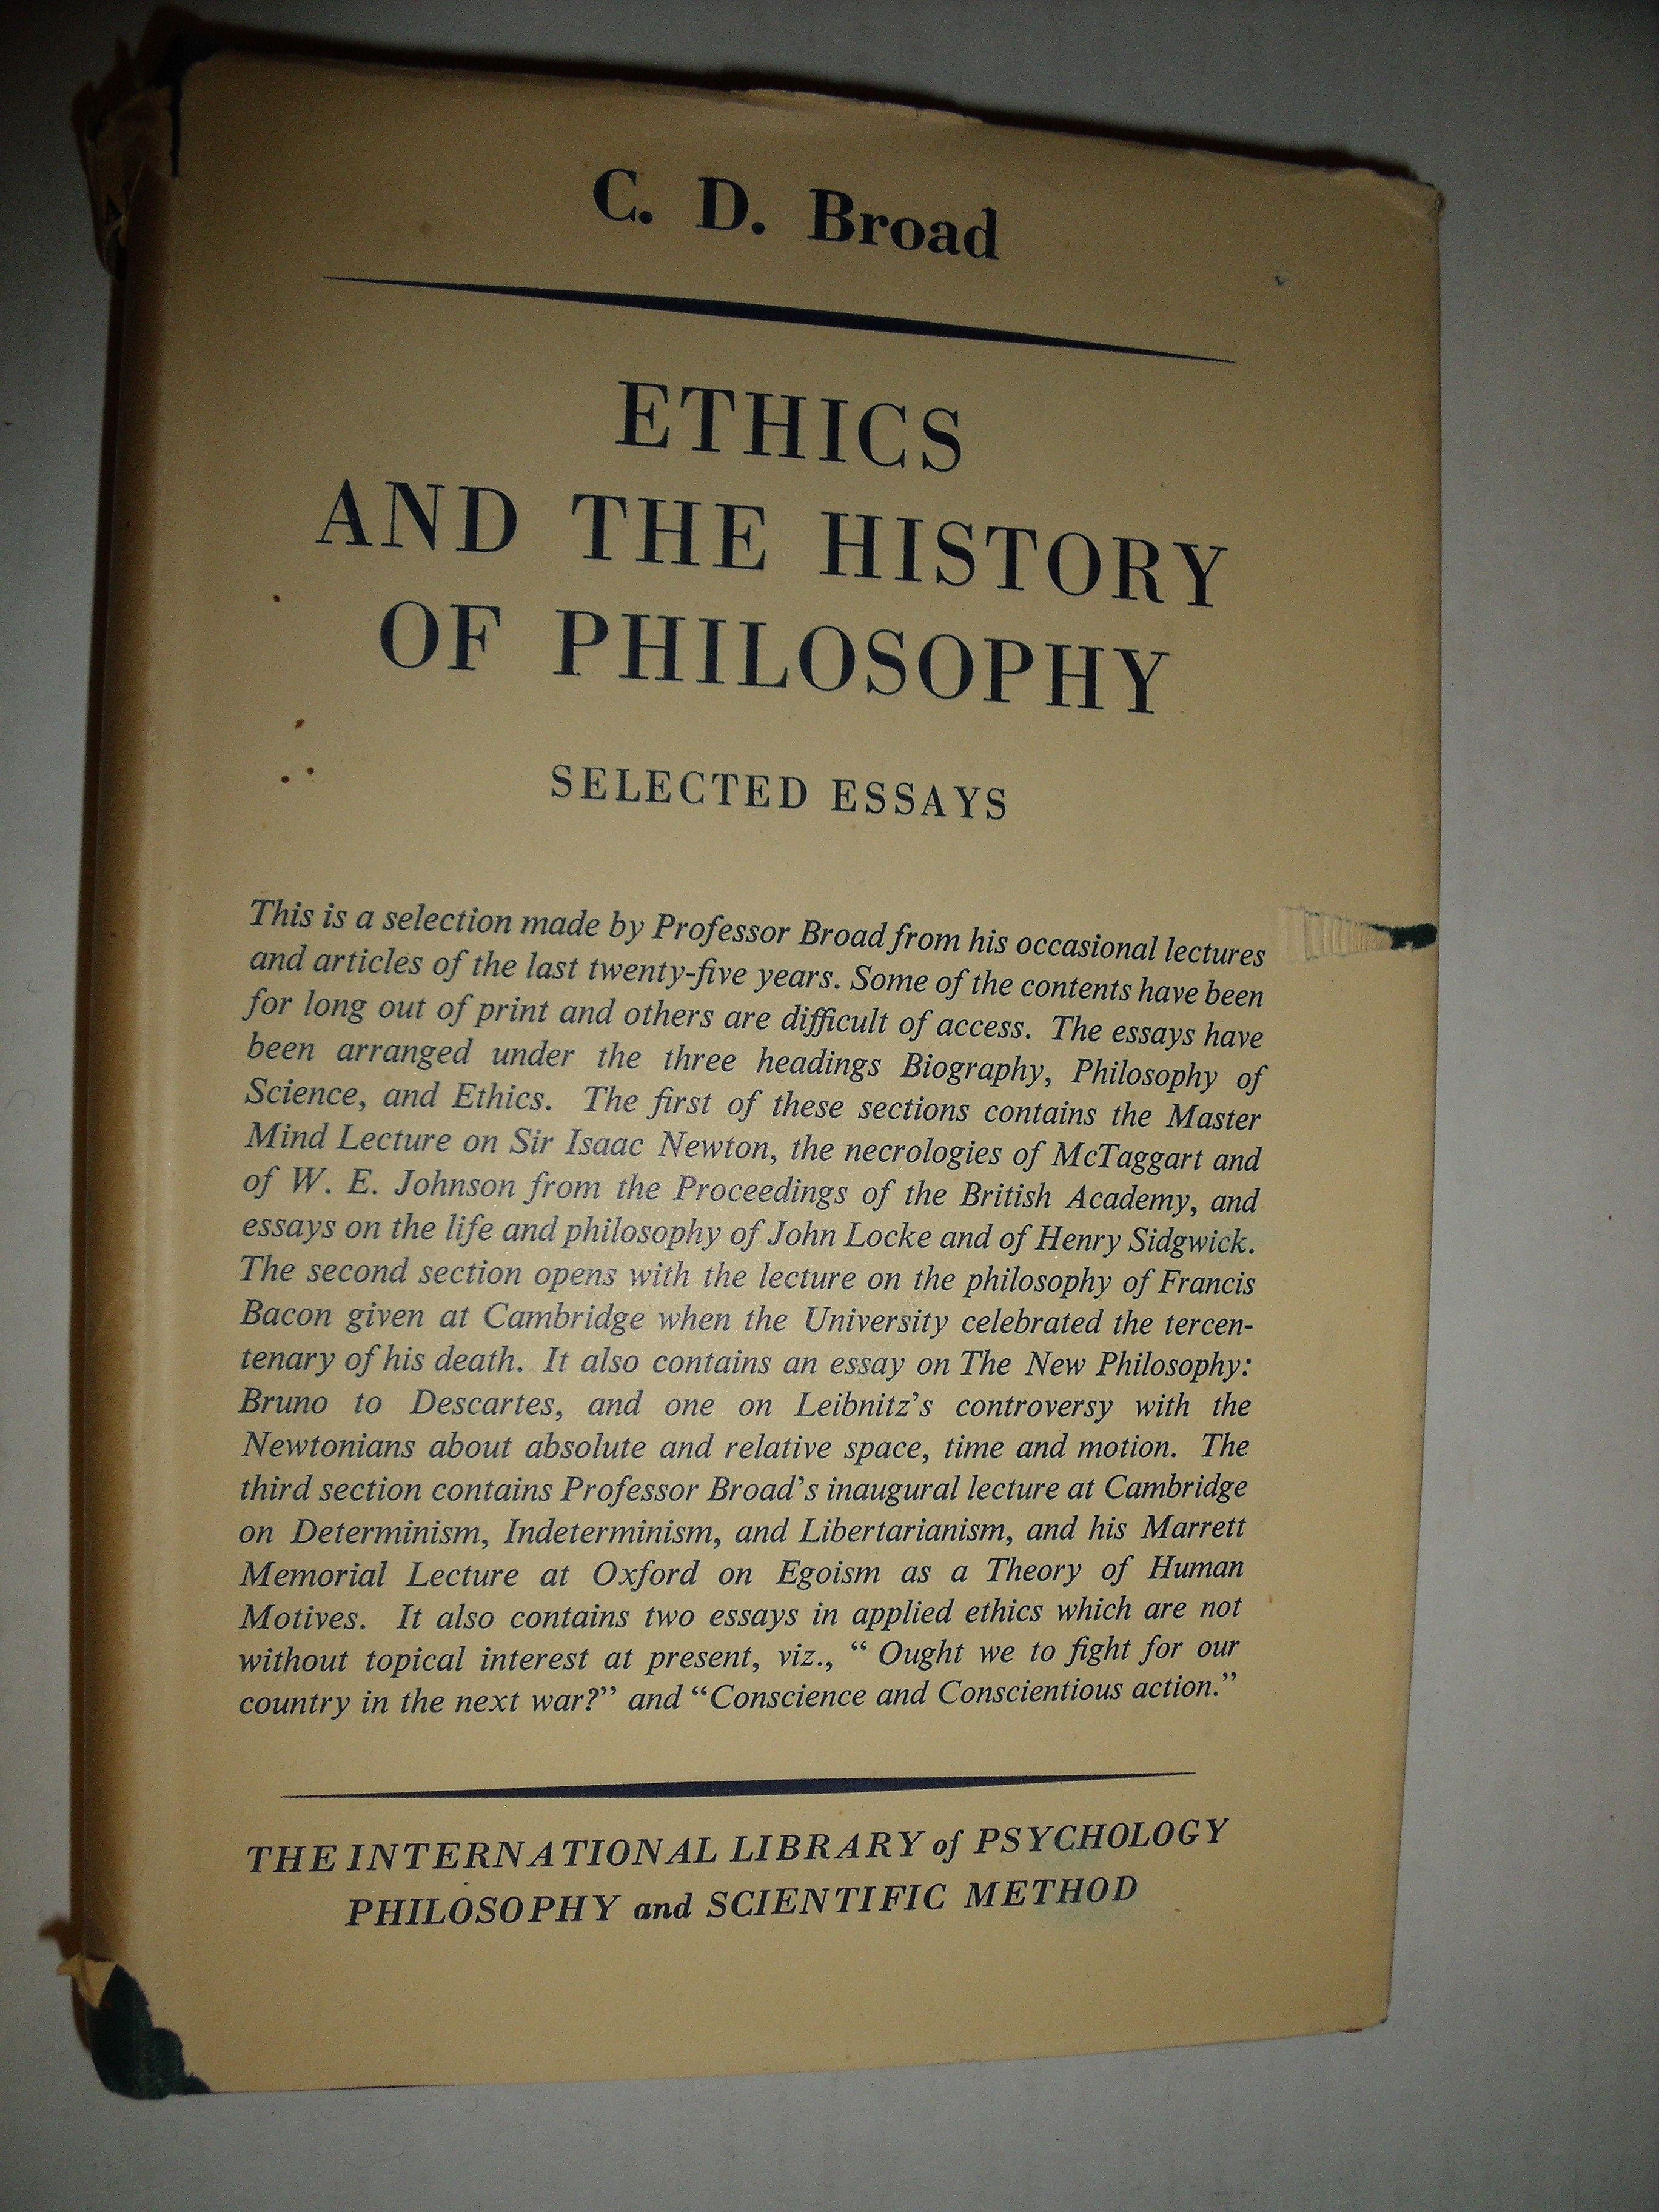 philosophy essays history ethics Encuentra ethics and the history of philosophy: selected essays: volume 13 (international library of philosophy) de cd broad (isbn: 9780415225304) en amazon.